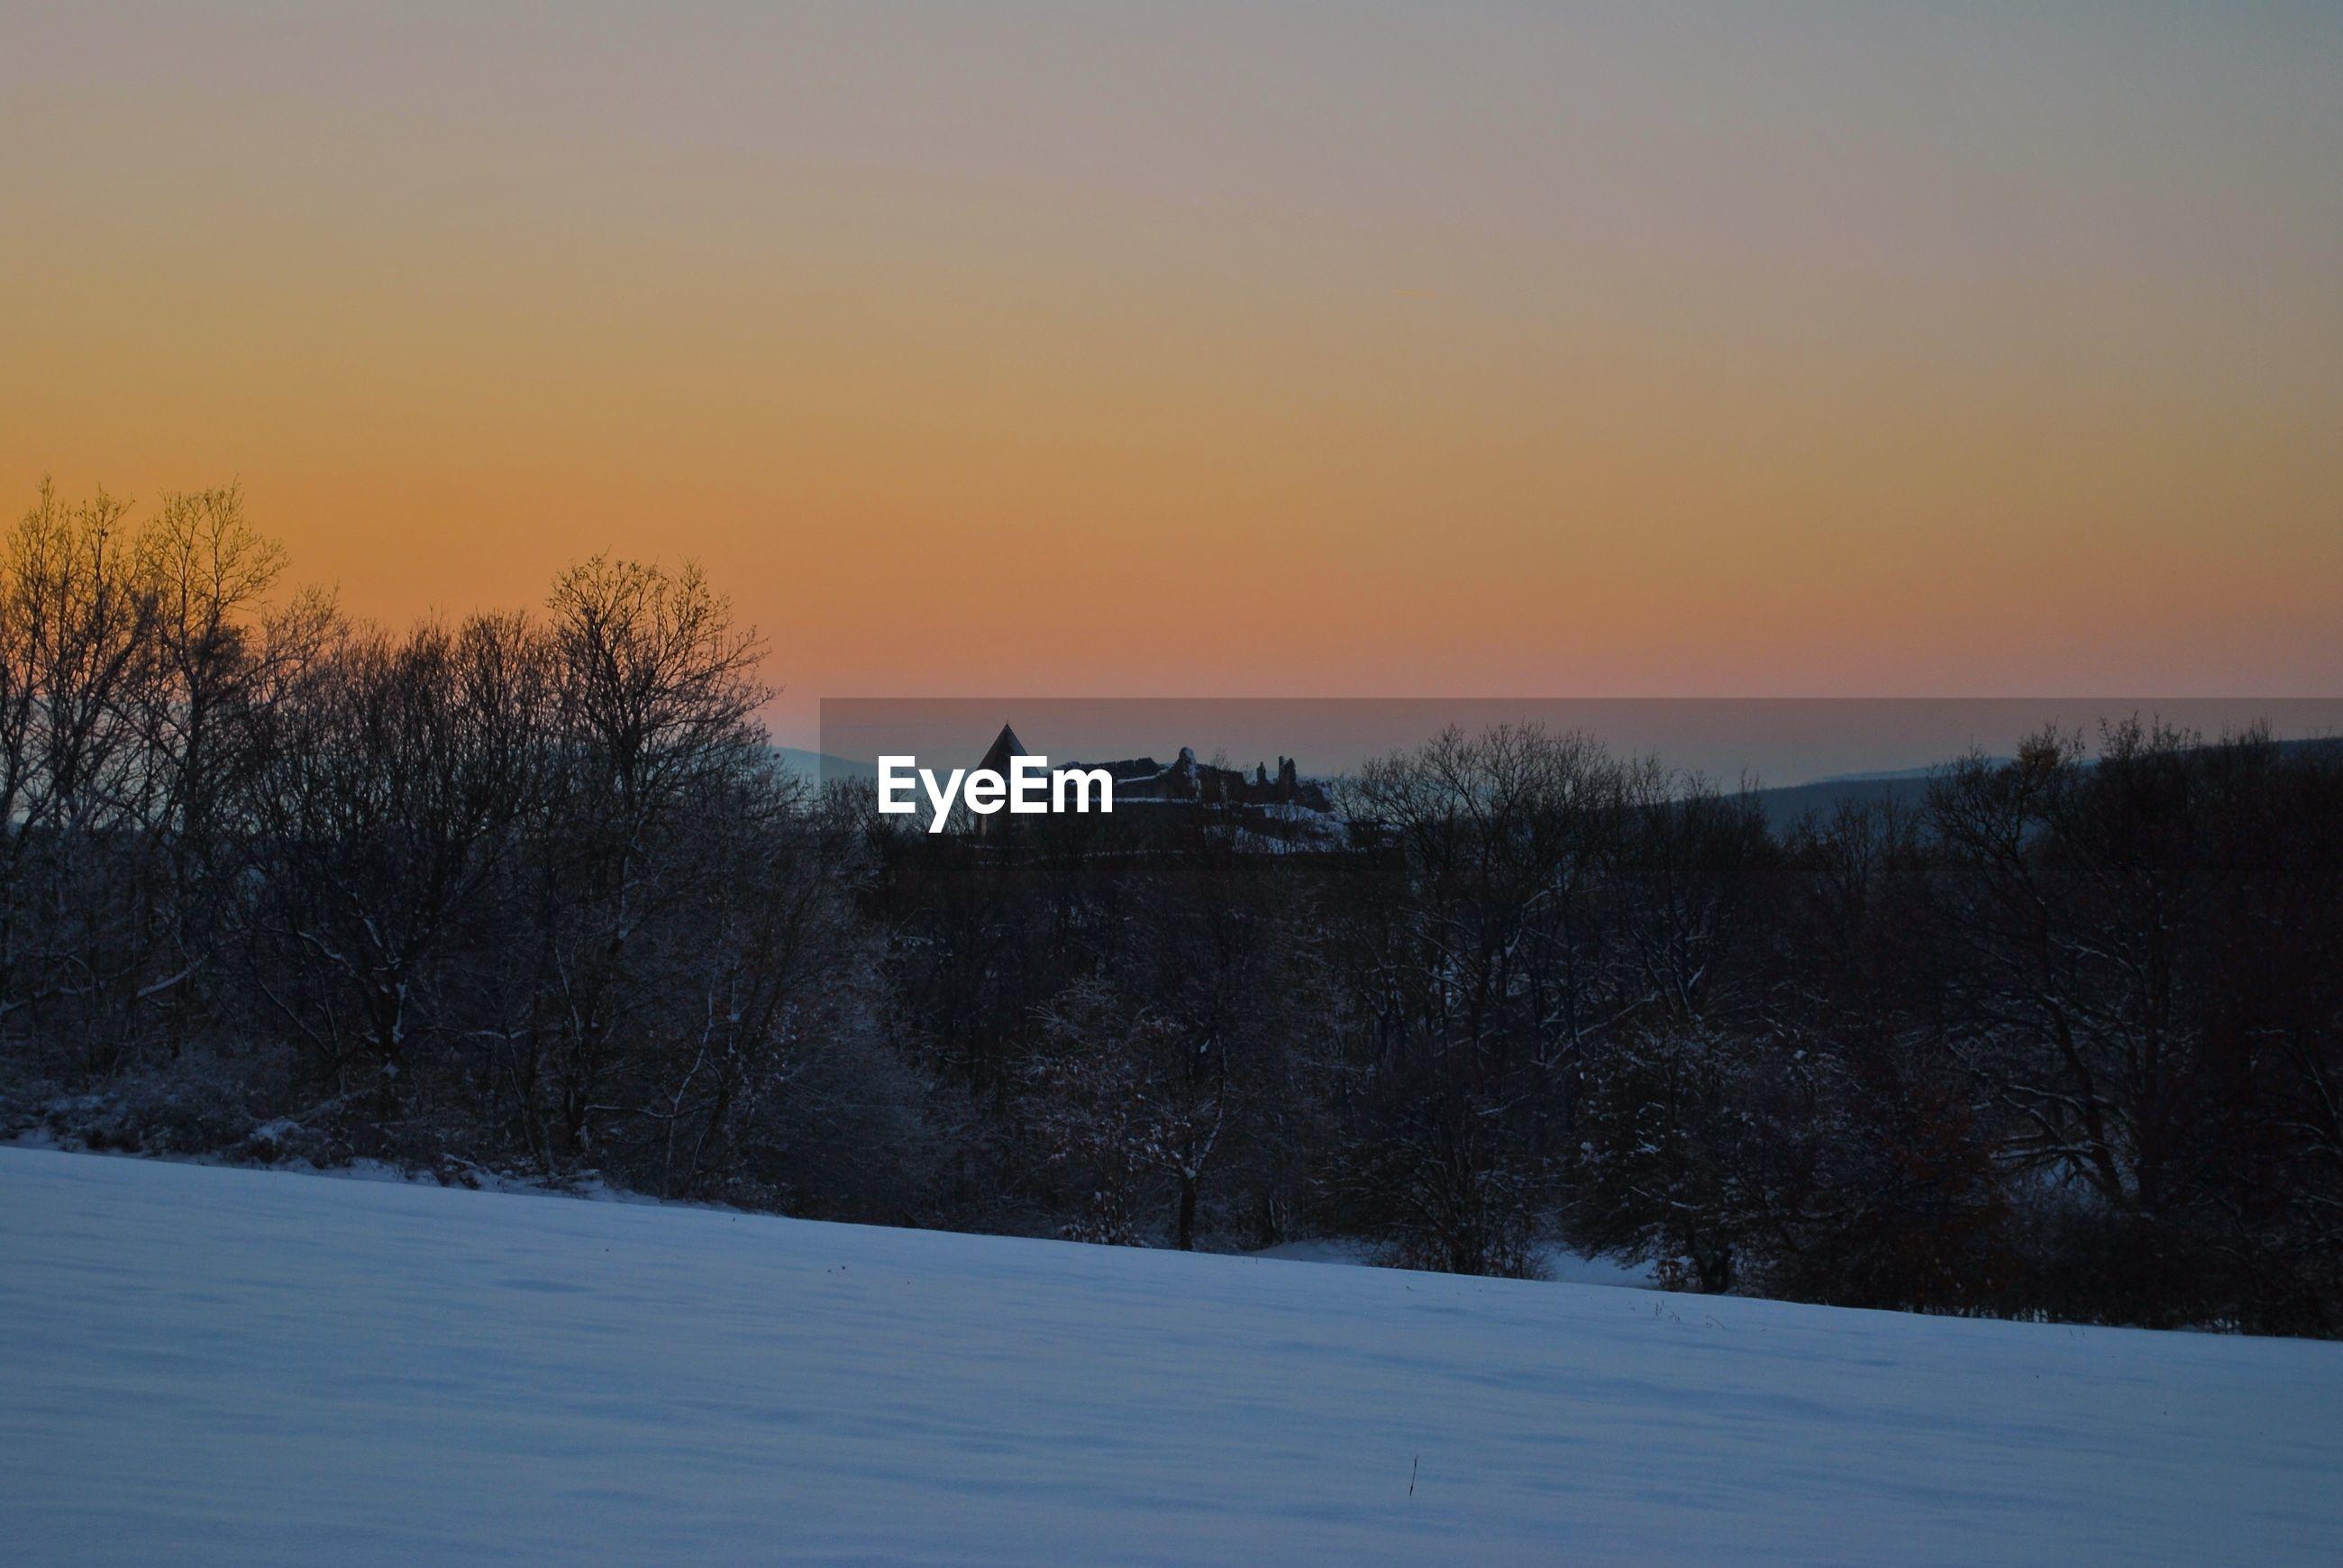 BARE TREES ON SNOW LANDSCAPE AGAINST SKY